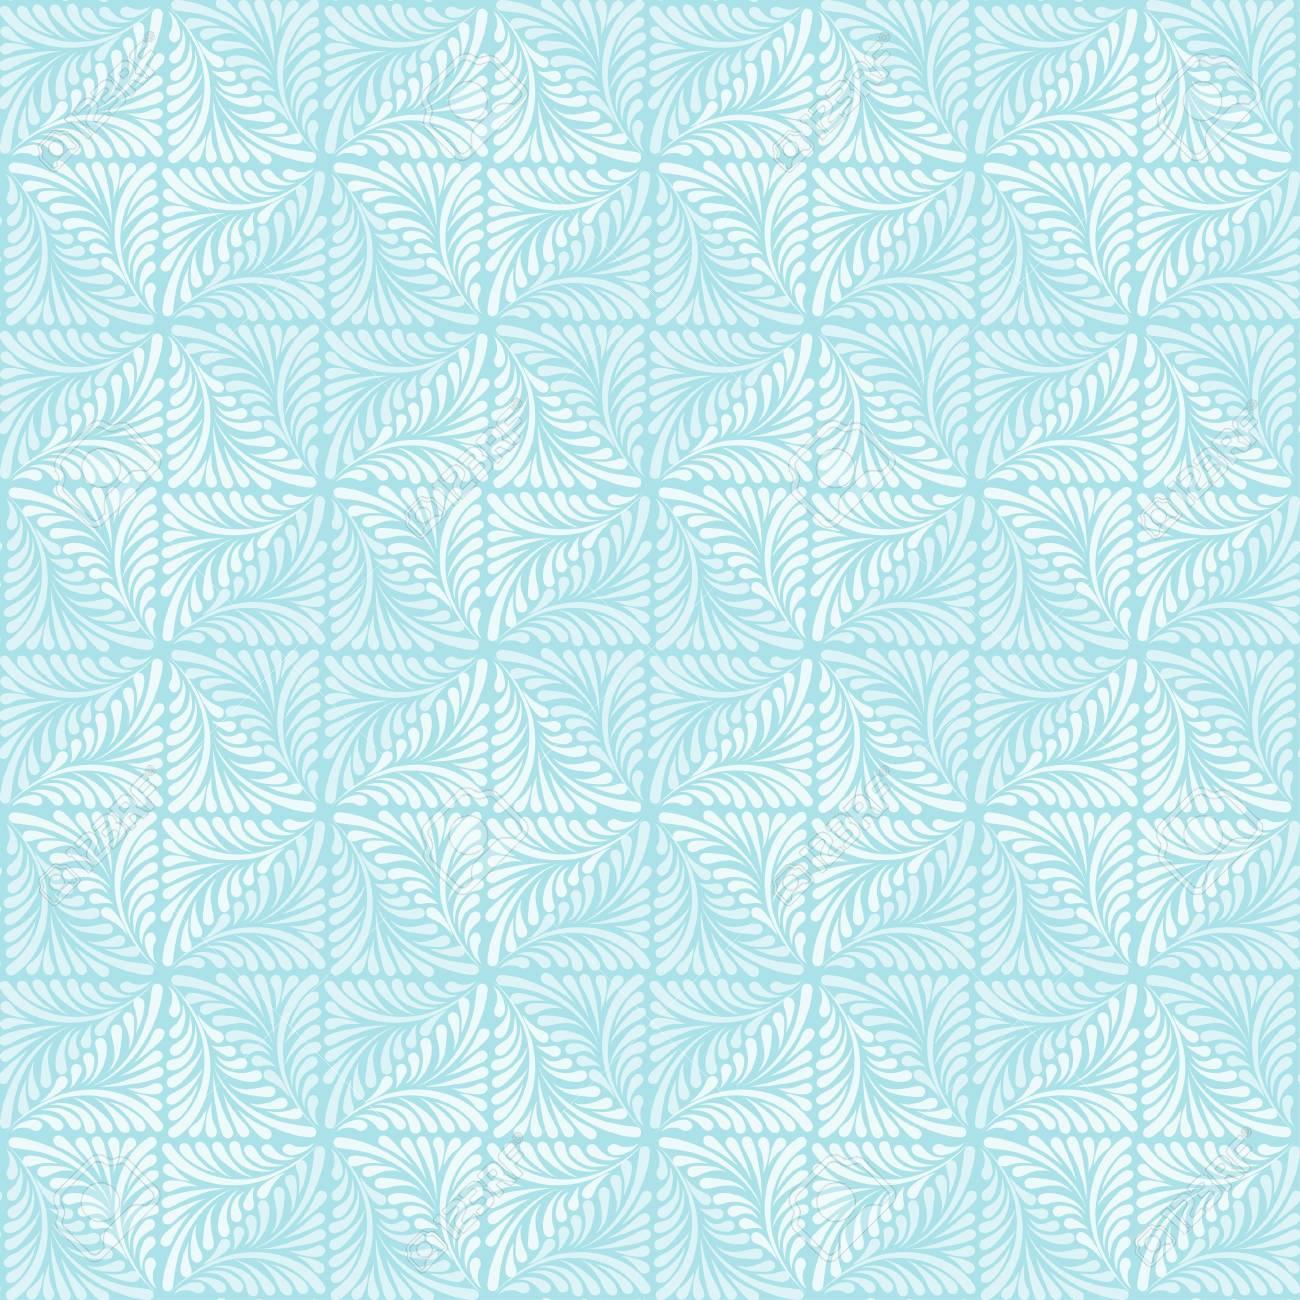 Seamless vintage wallpaper, floral pattern, retro wallpaper Stock Vector - 15809999